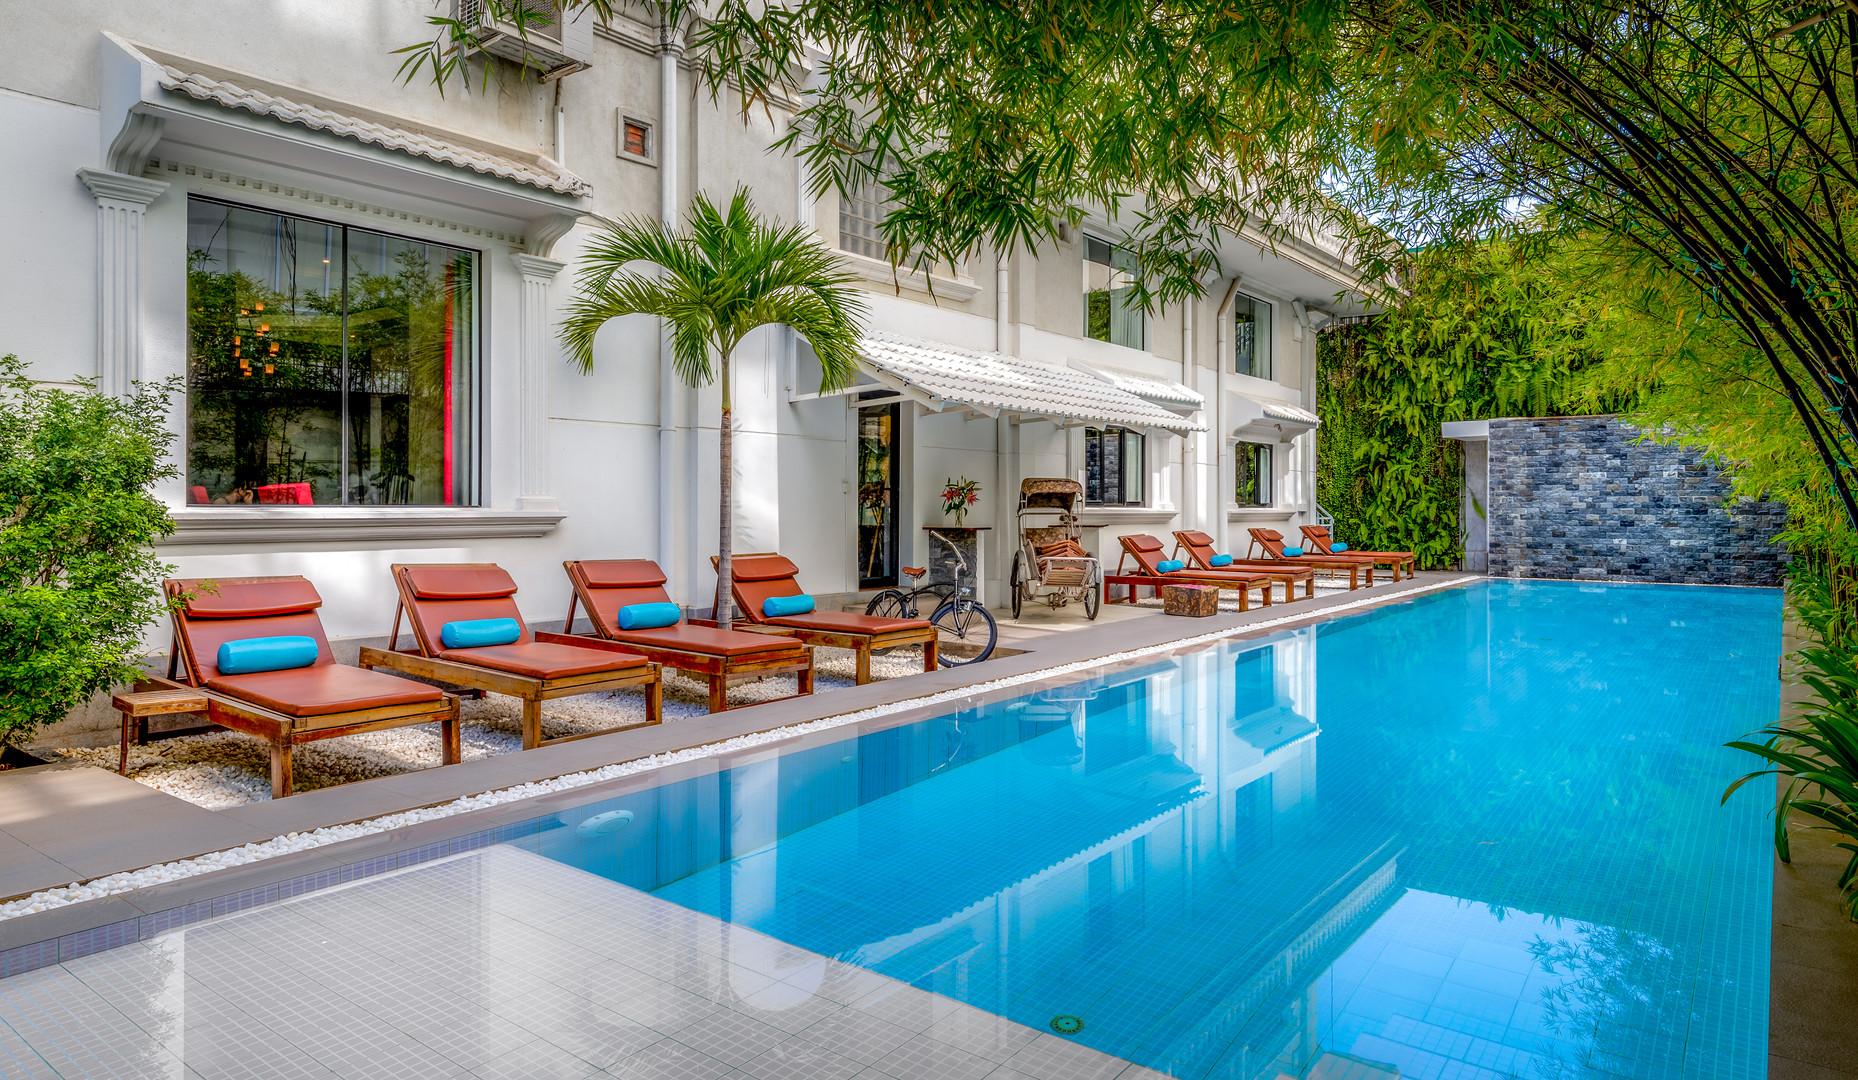 White Mansion Boutique Hotel, Phnom Penh Cambodia